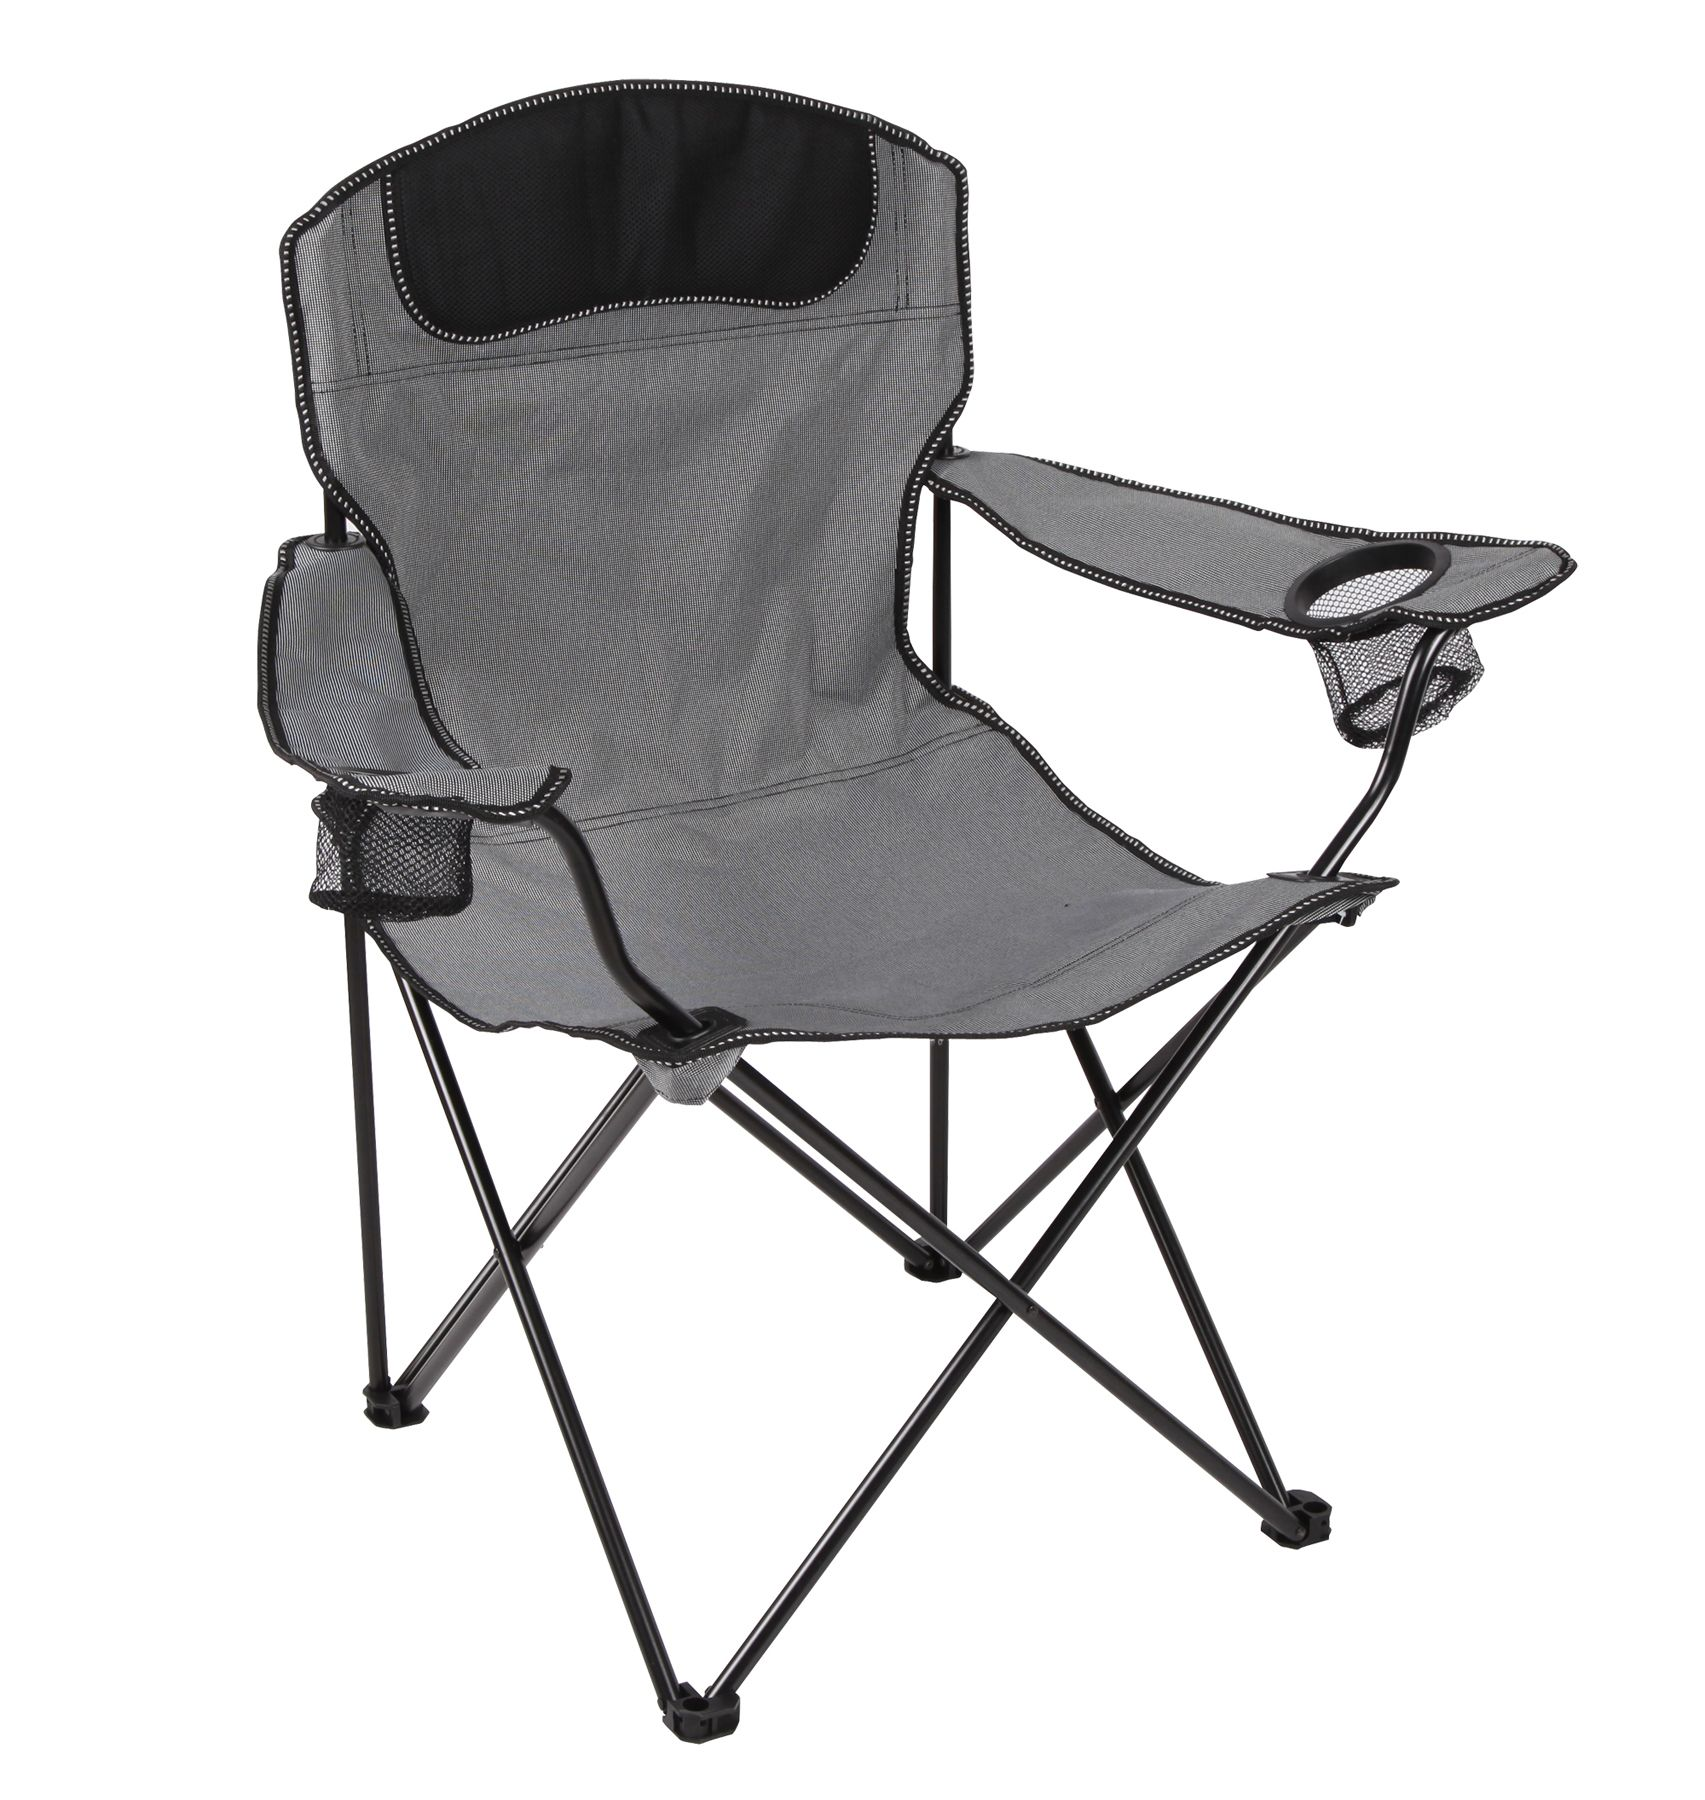 ozark trail oversized mesh chair desk online embark upc and barcode upcitemdb